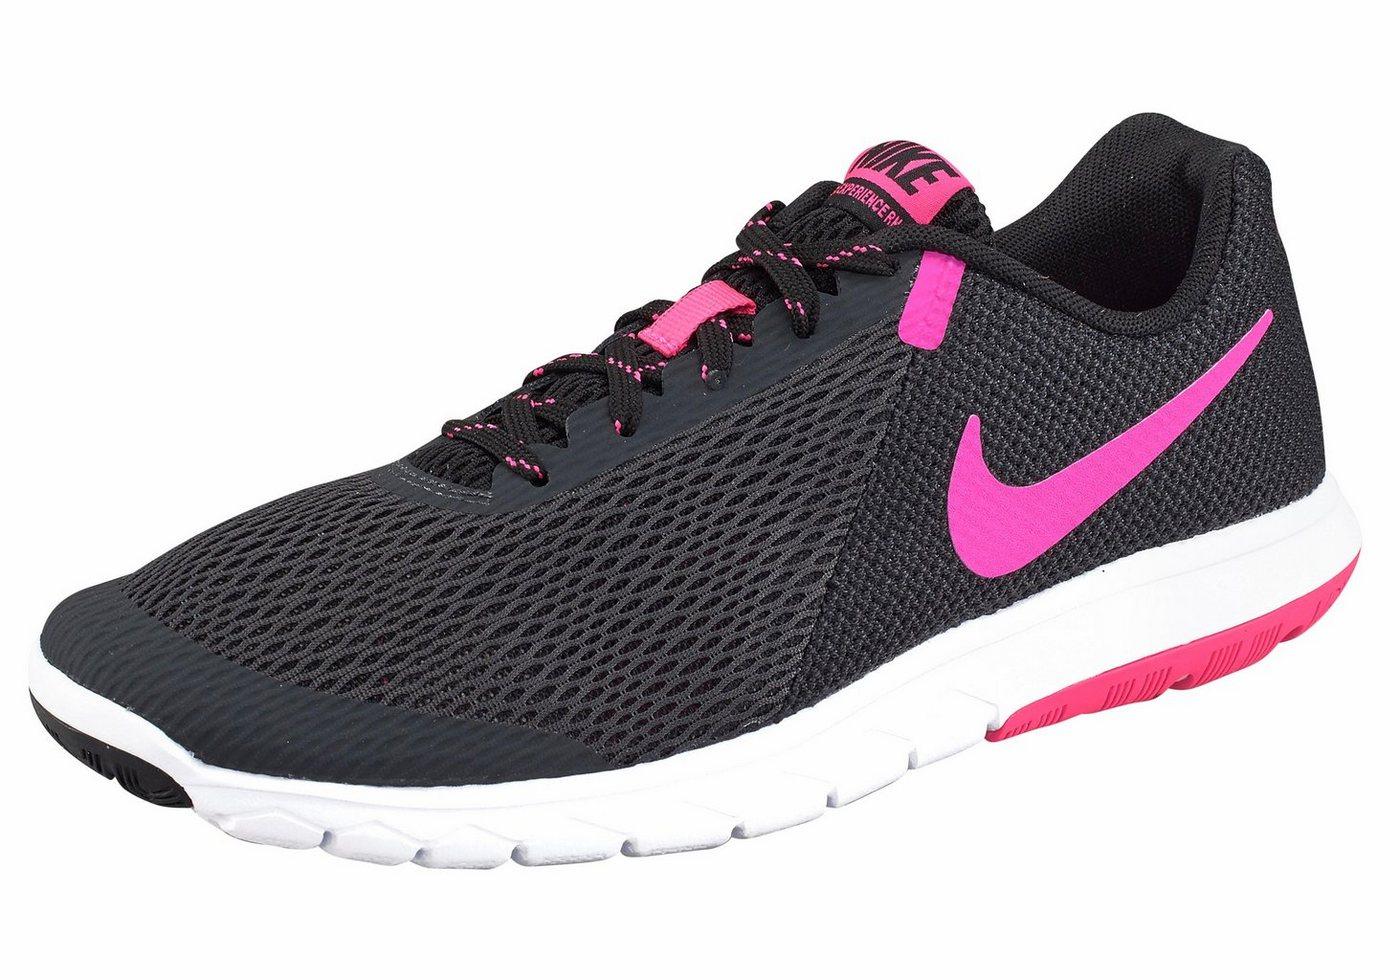 Nike »Flex Experience RN 5 Wmns« Laufschuh Sale Angebote Hornow-Wadelsdorf